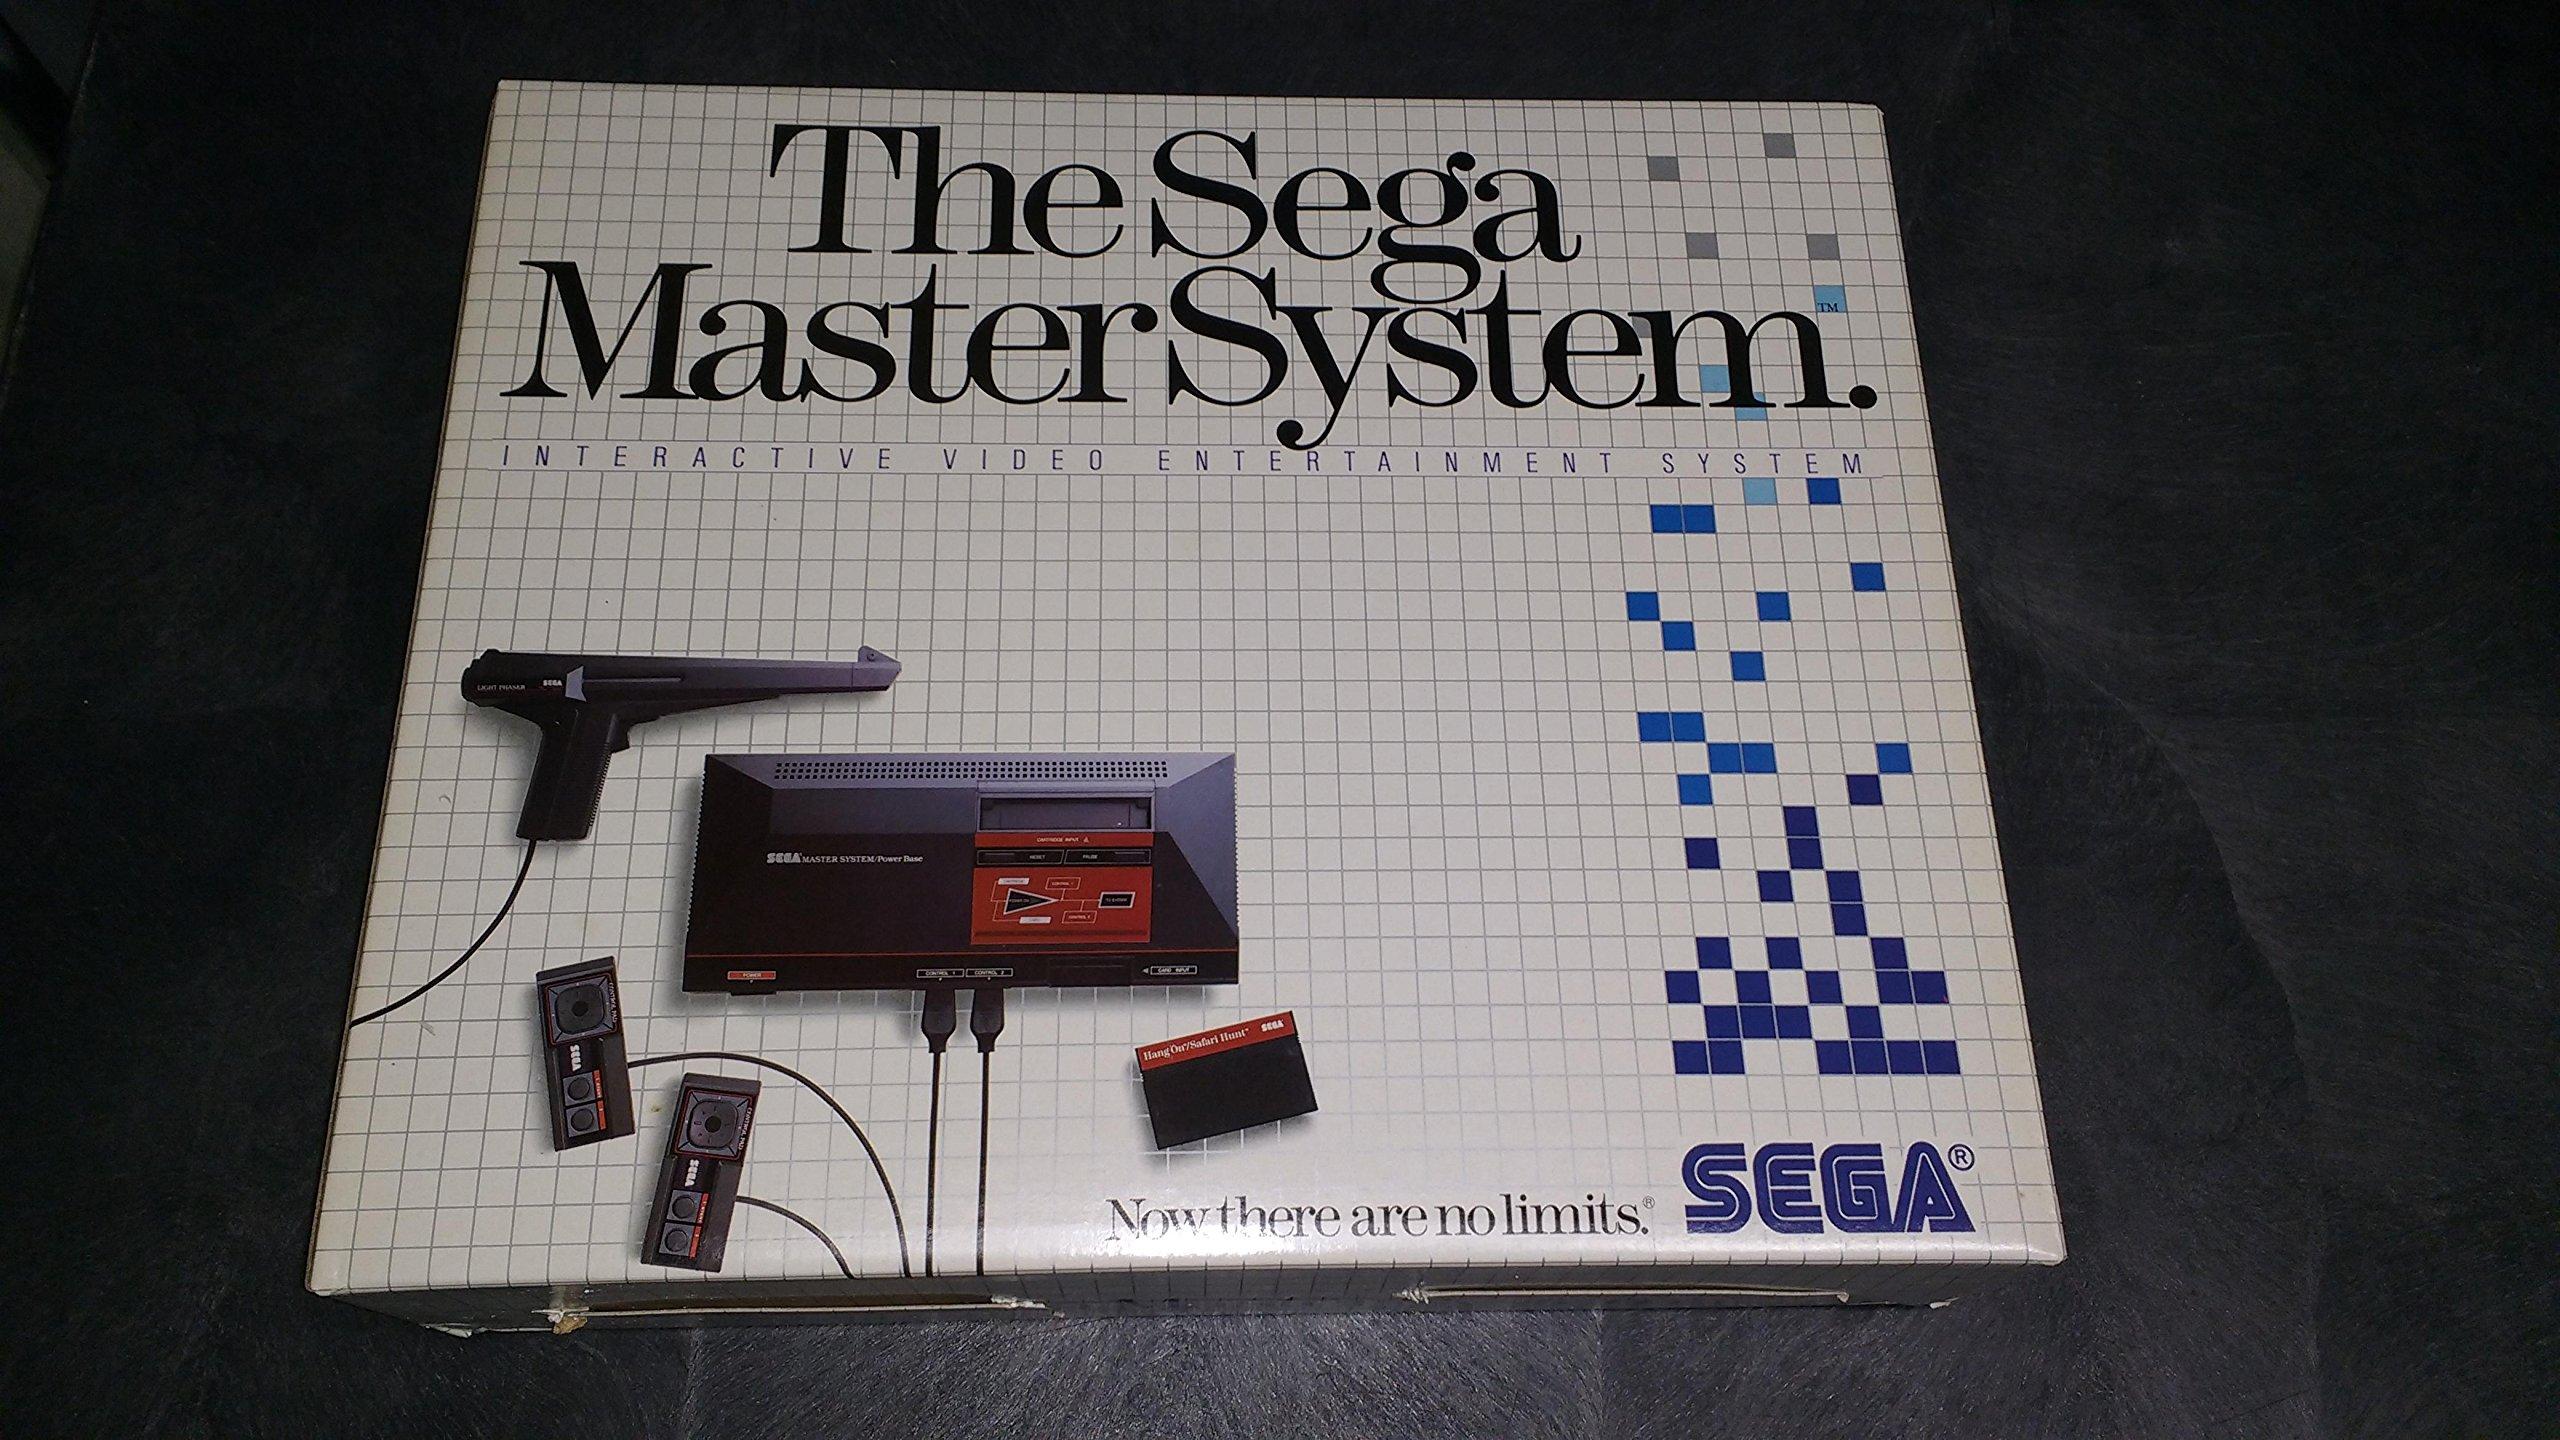 Sega Master System 1 - Video Game Console